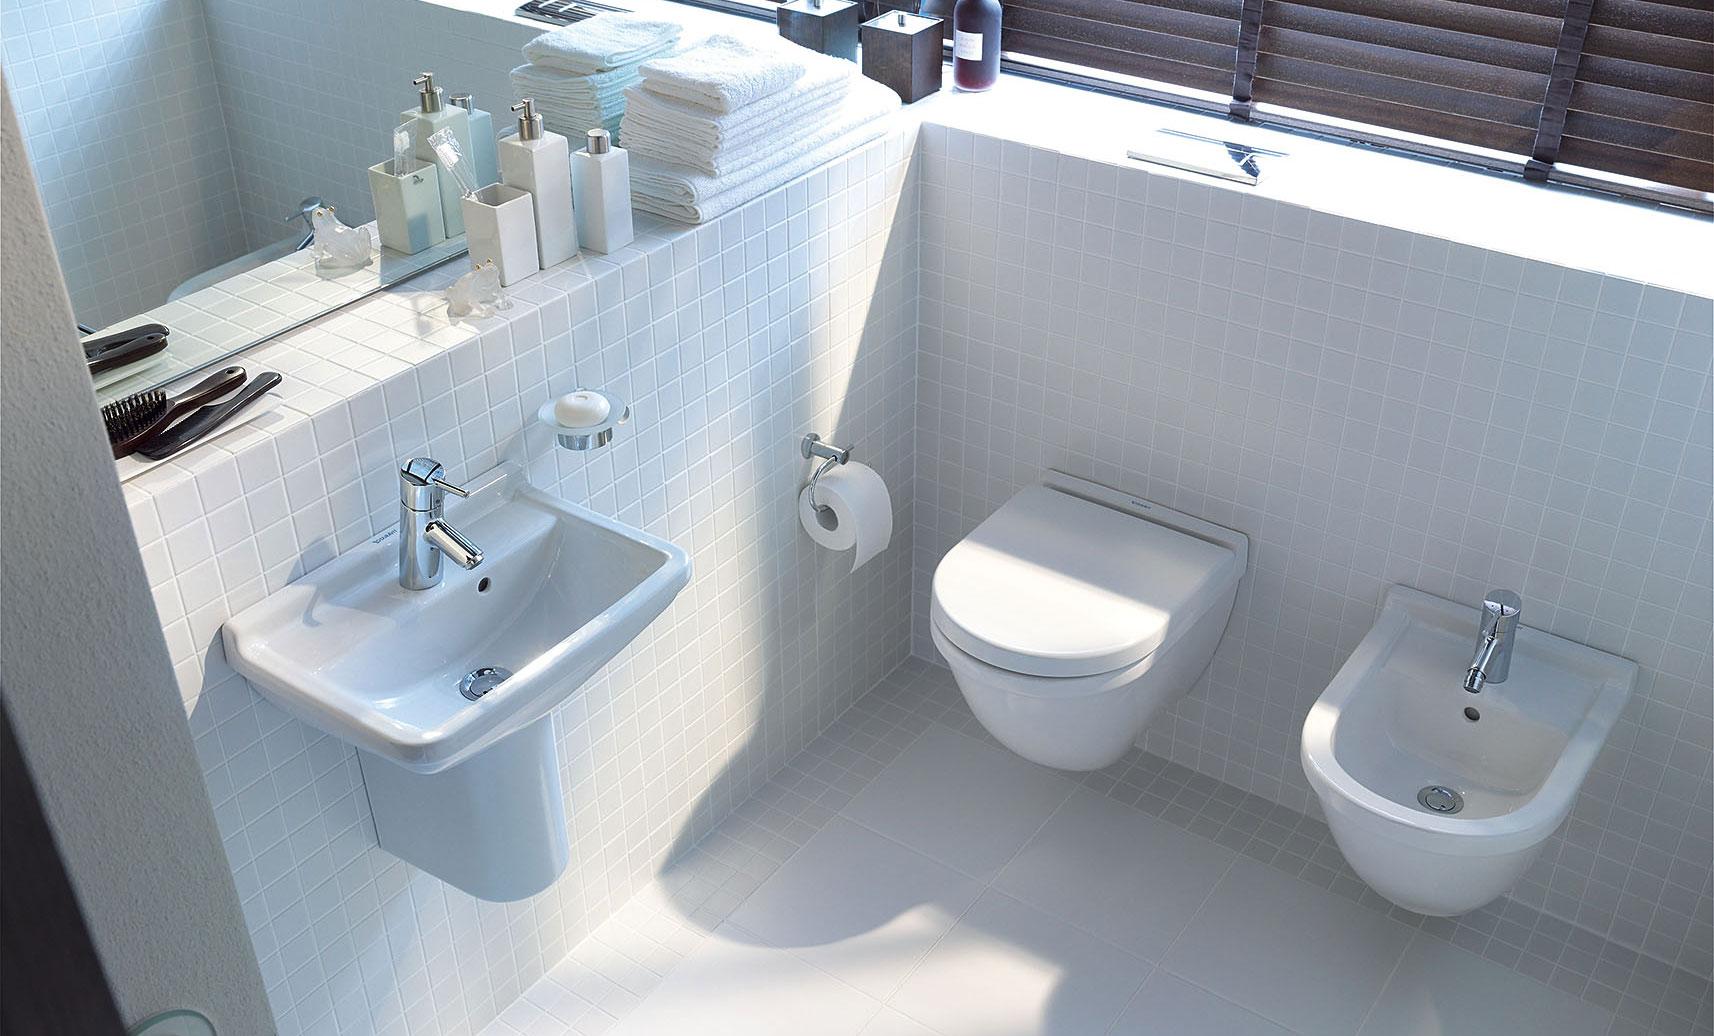 Grote Frisse Badkamer : Gastenbadkamer duravit